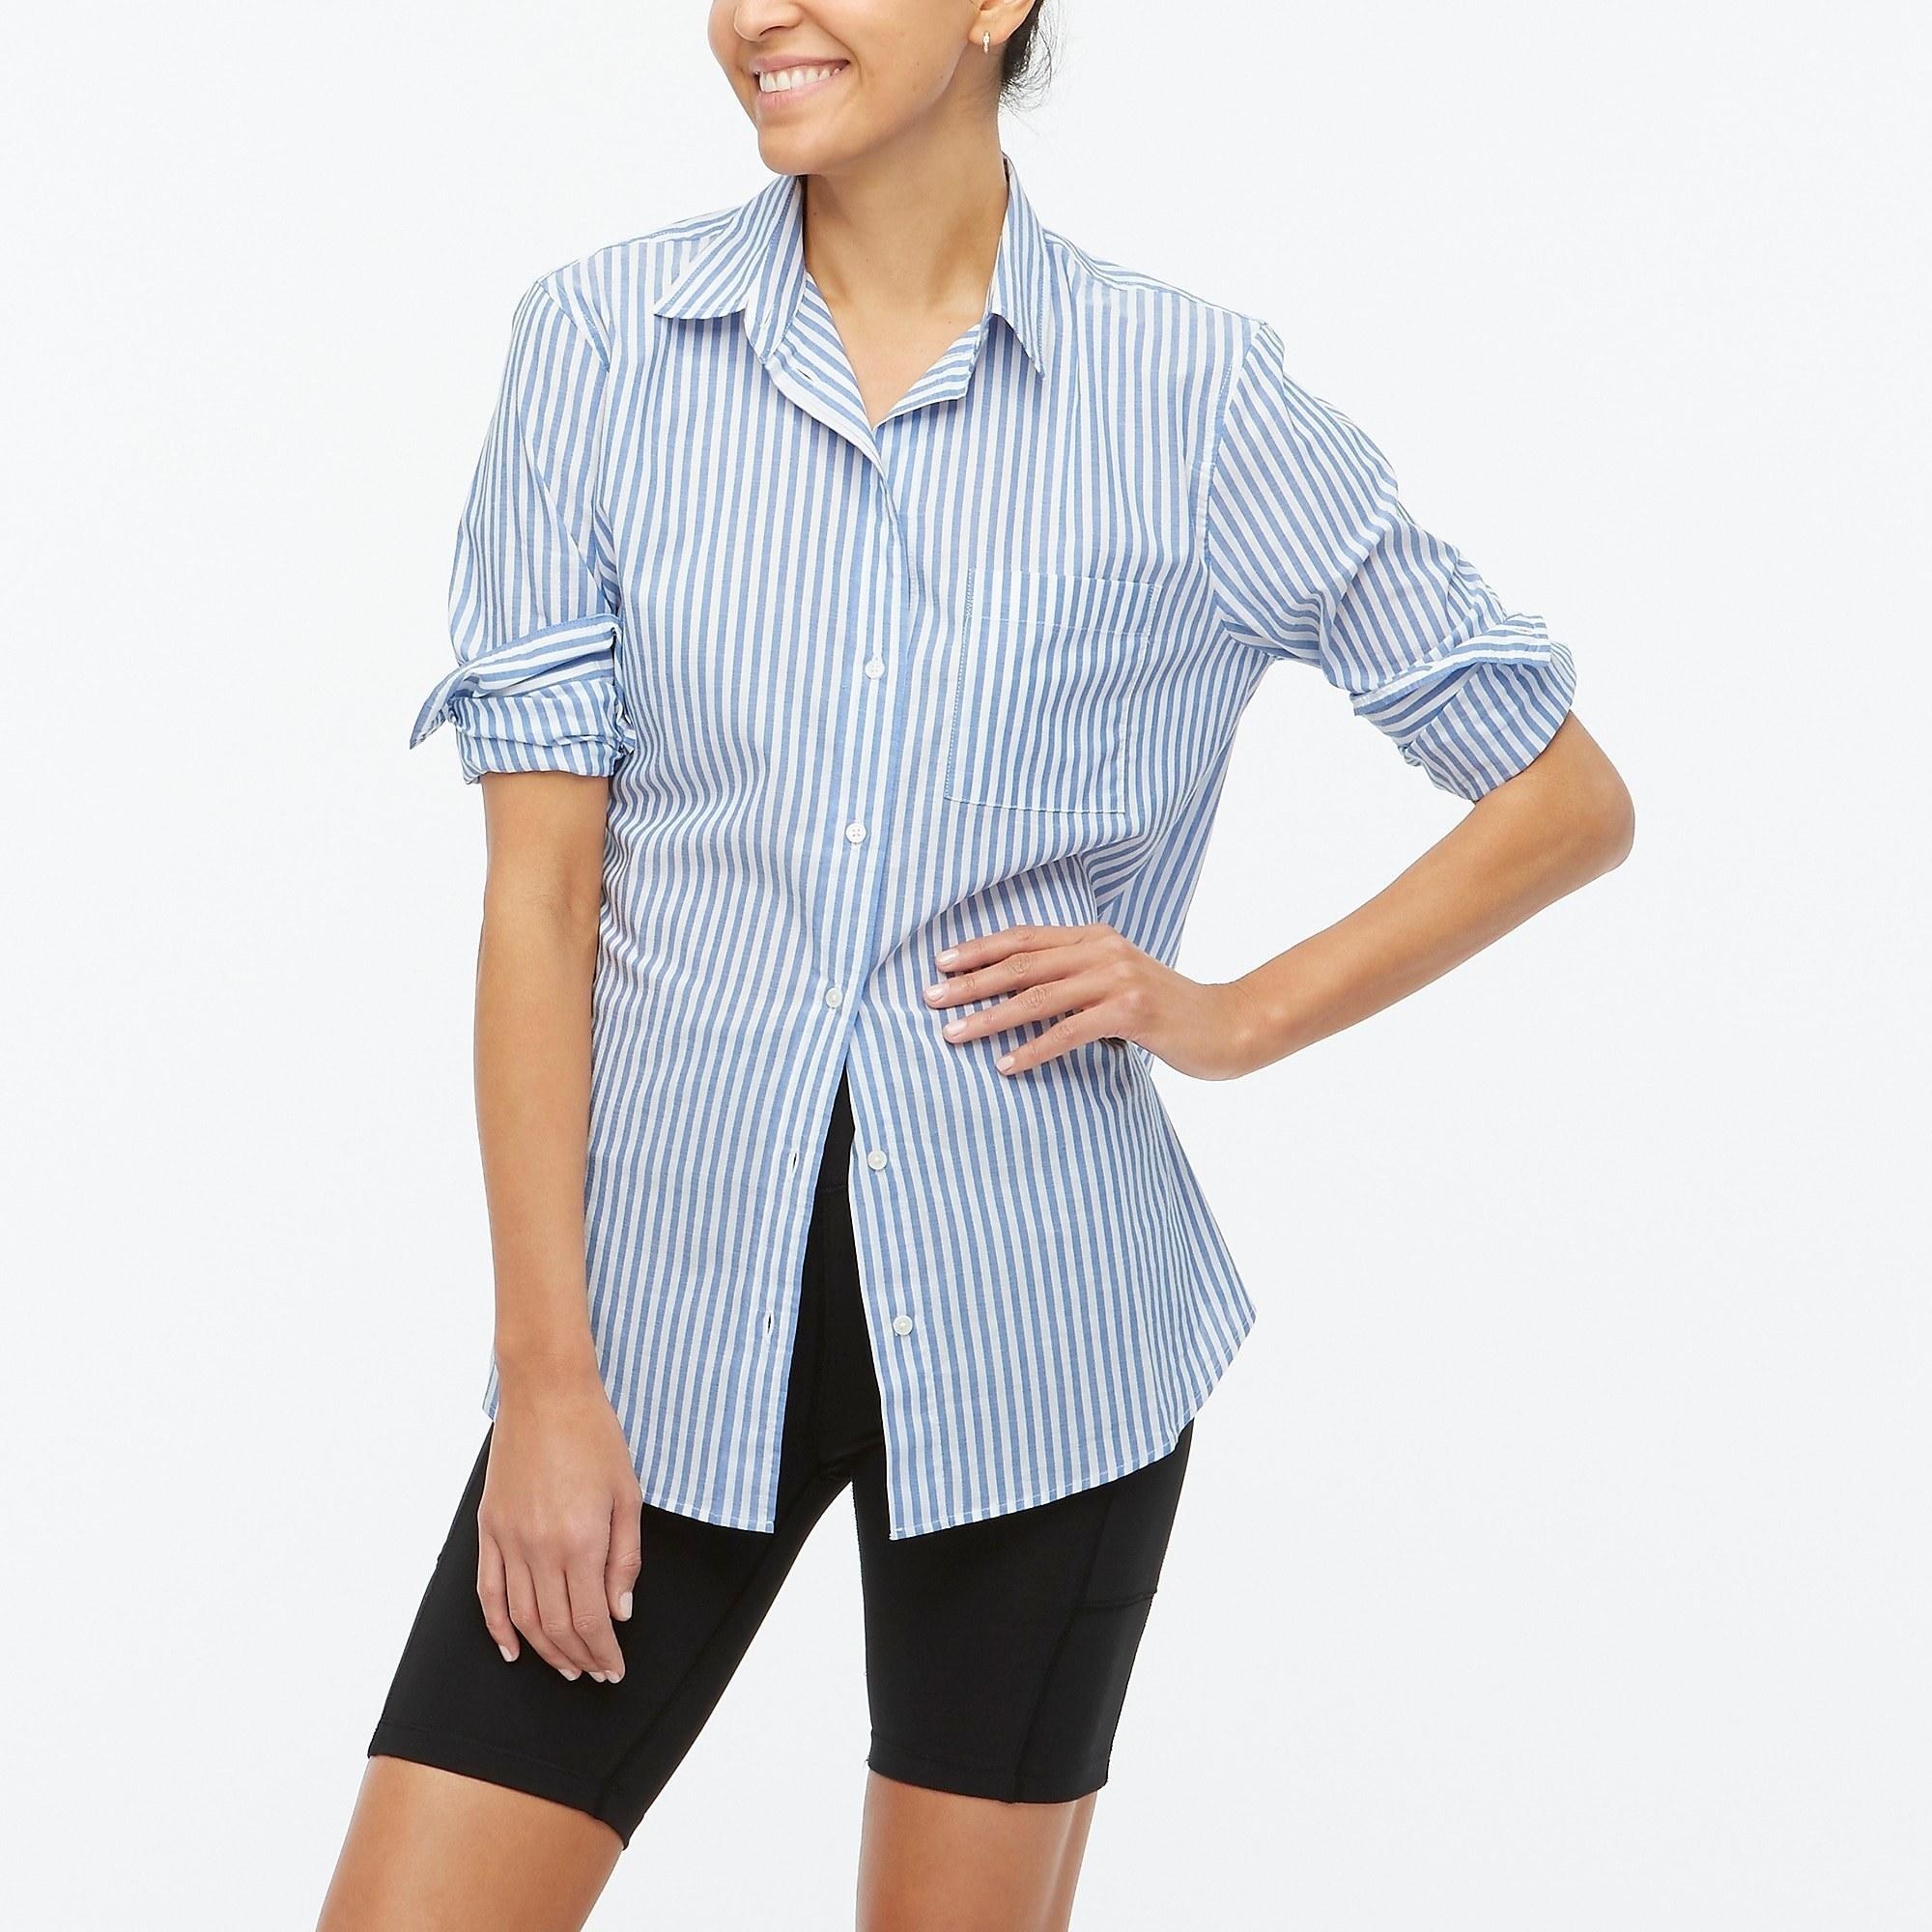 model wearing blue striped button up shirt